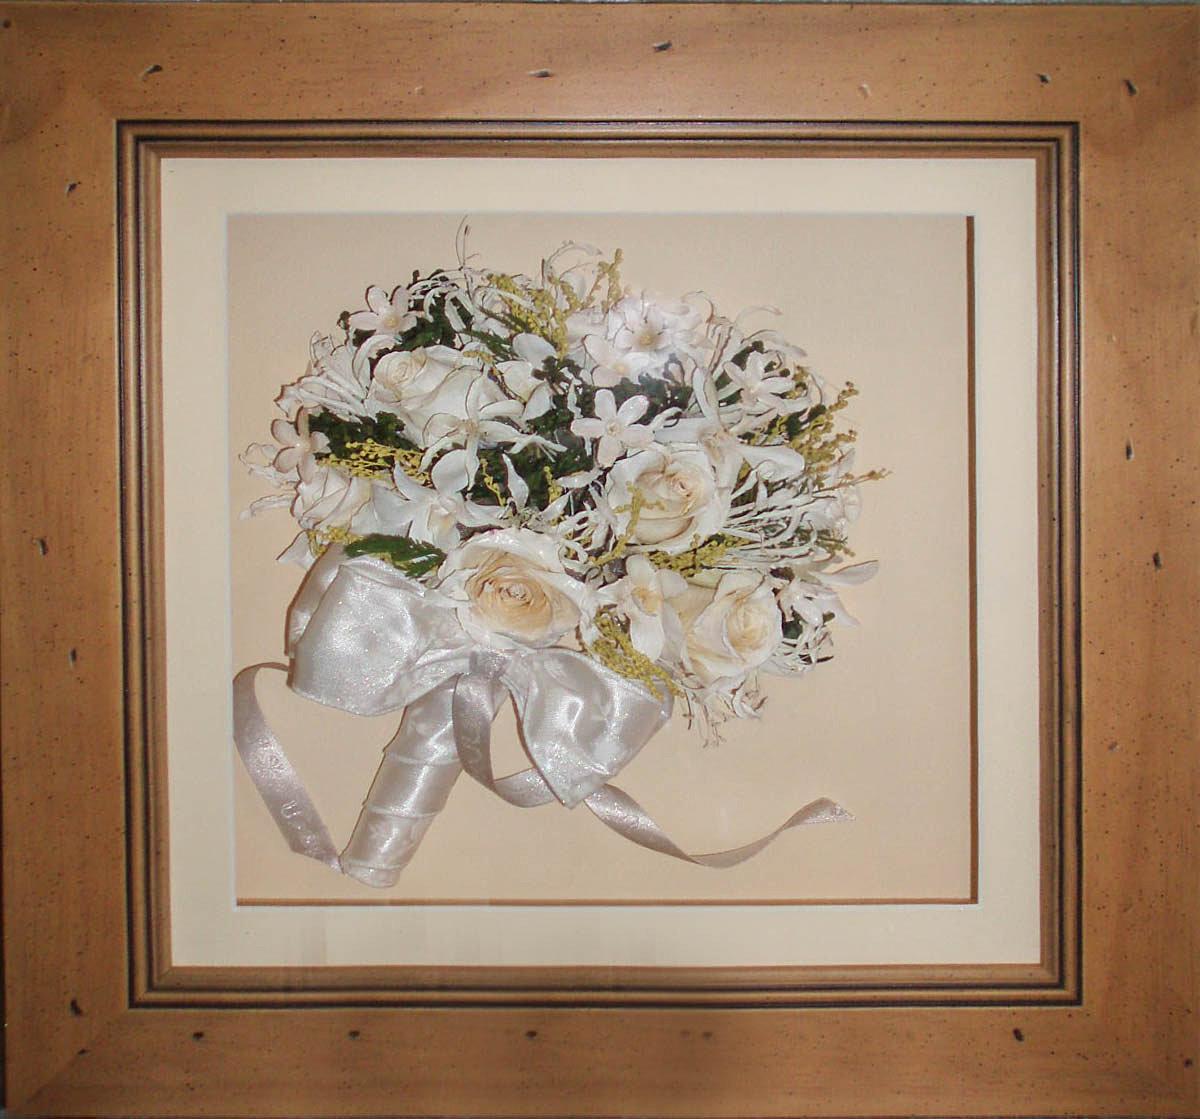 Wedding Bouquet Preservation Company : Flowersforeverever wedding bouquet preservation